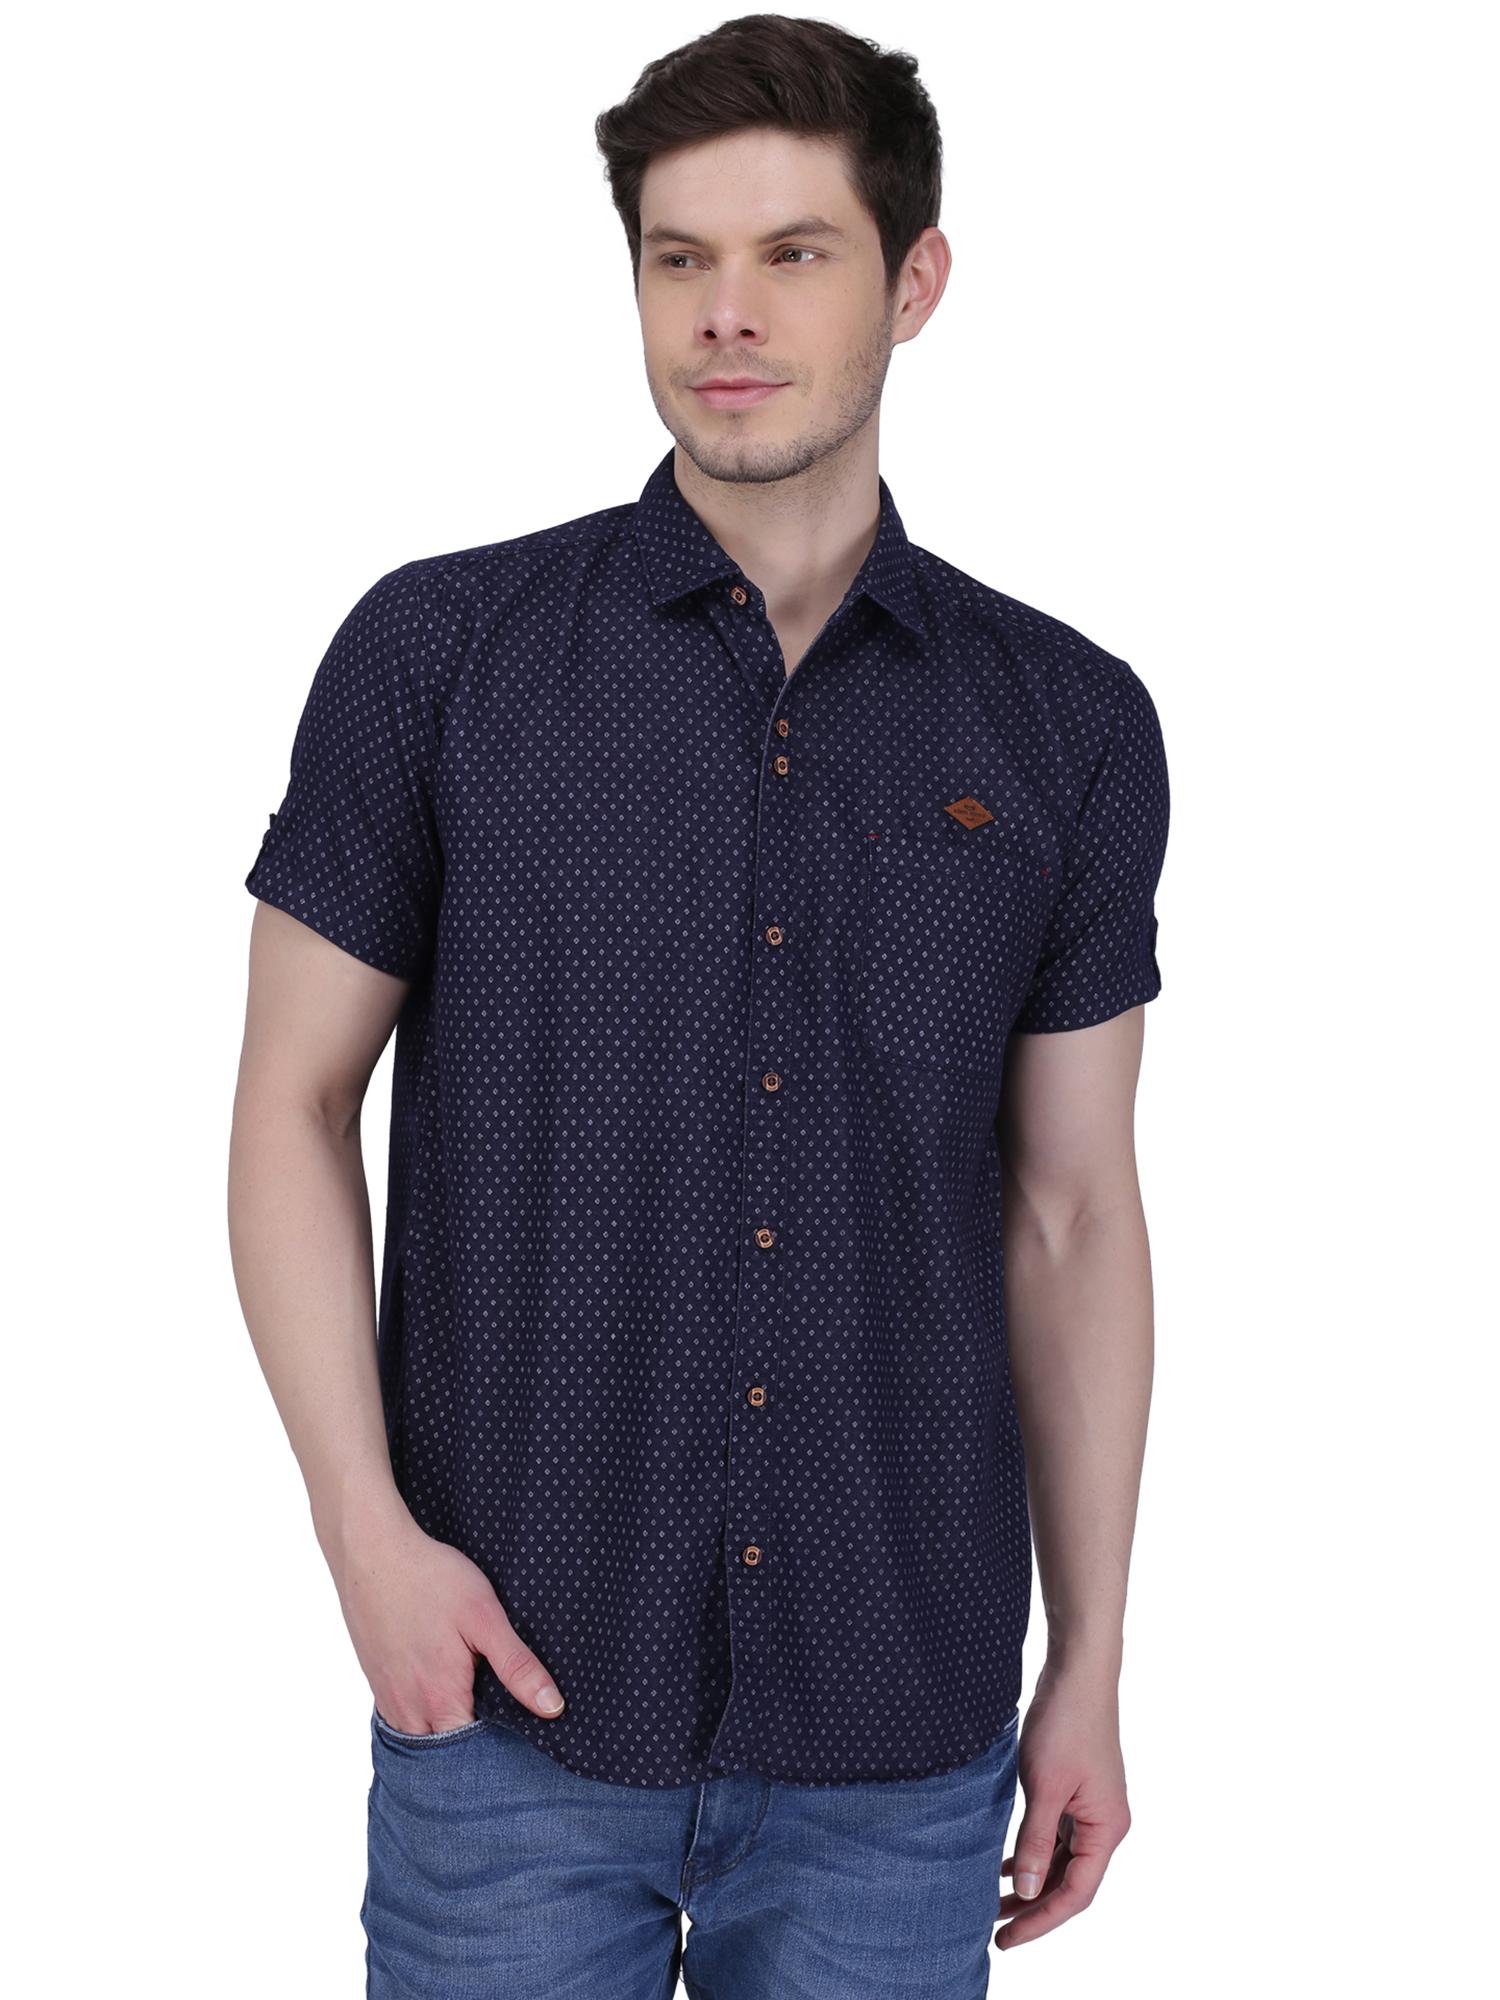 Kuons Avenue   Kuons Avenue Men's Indigo Print Half Sleeve Denim Shirt- KACLHS1188IG